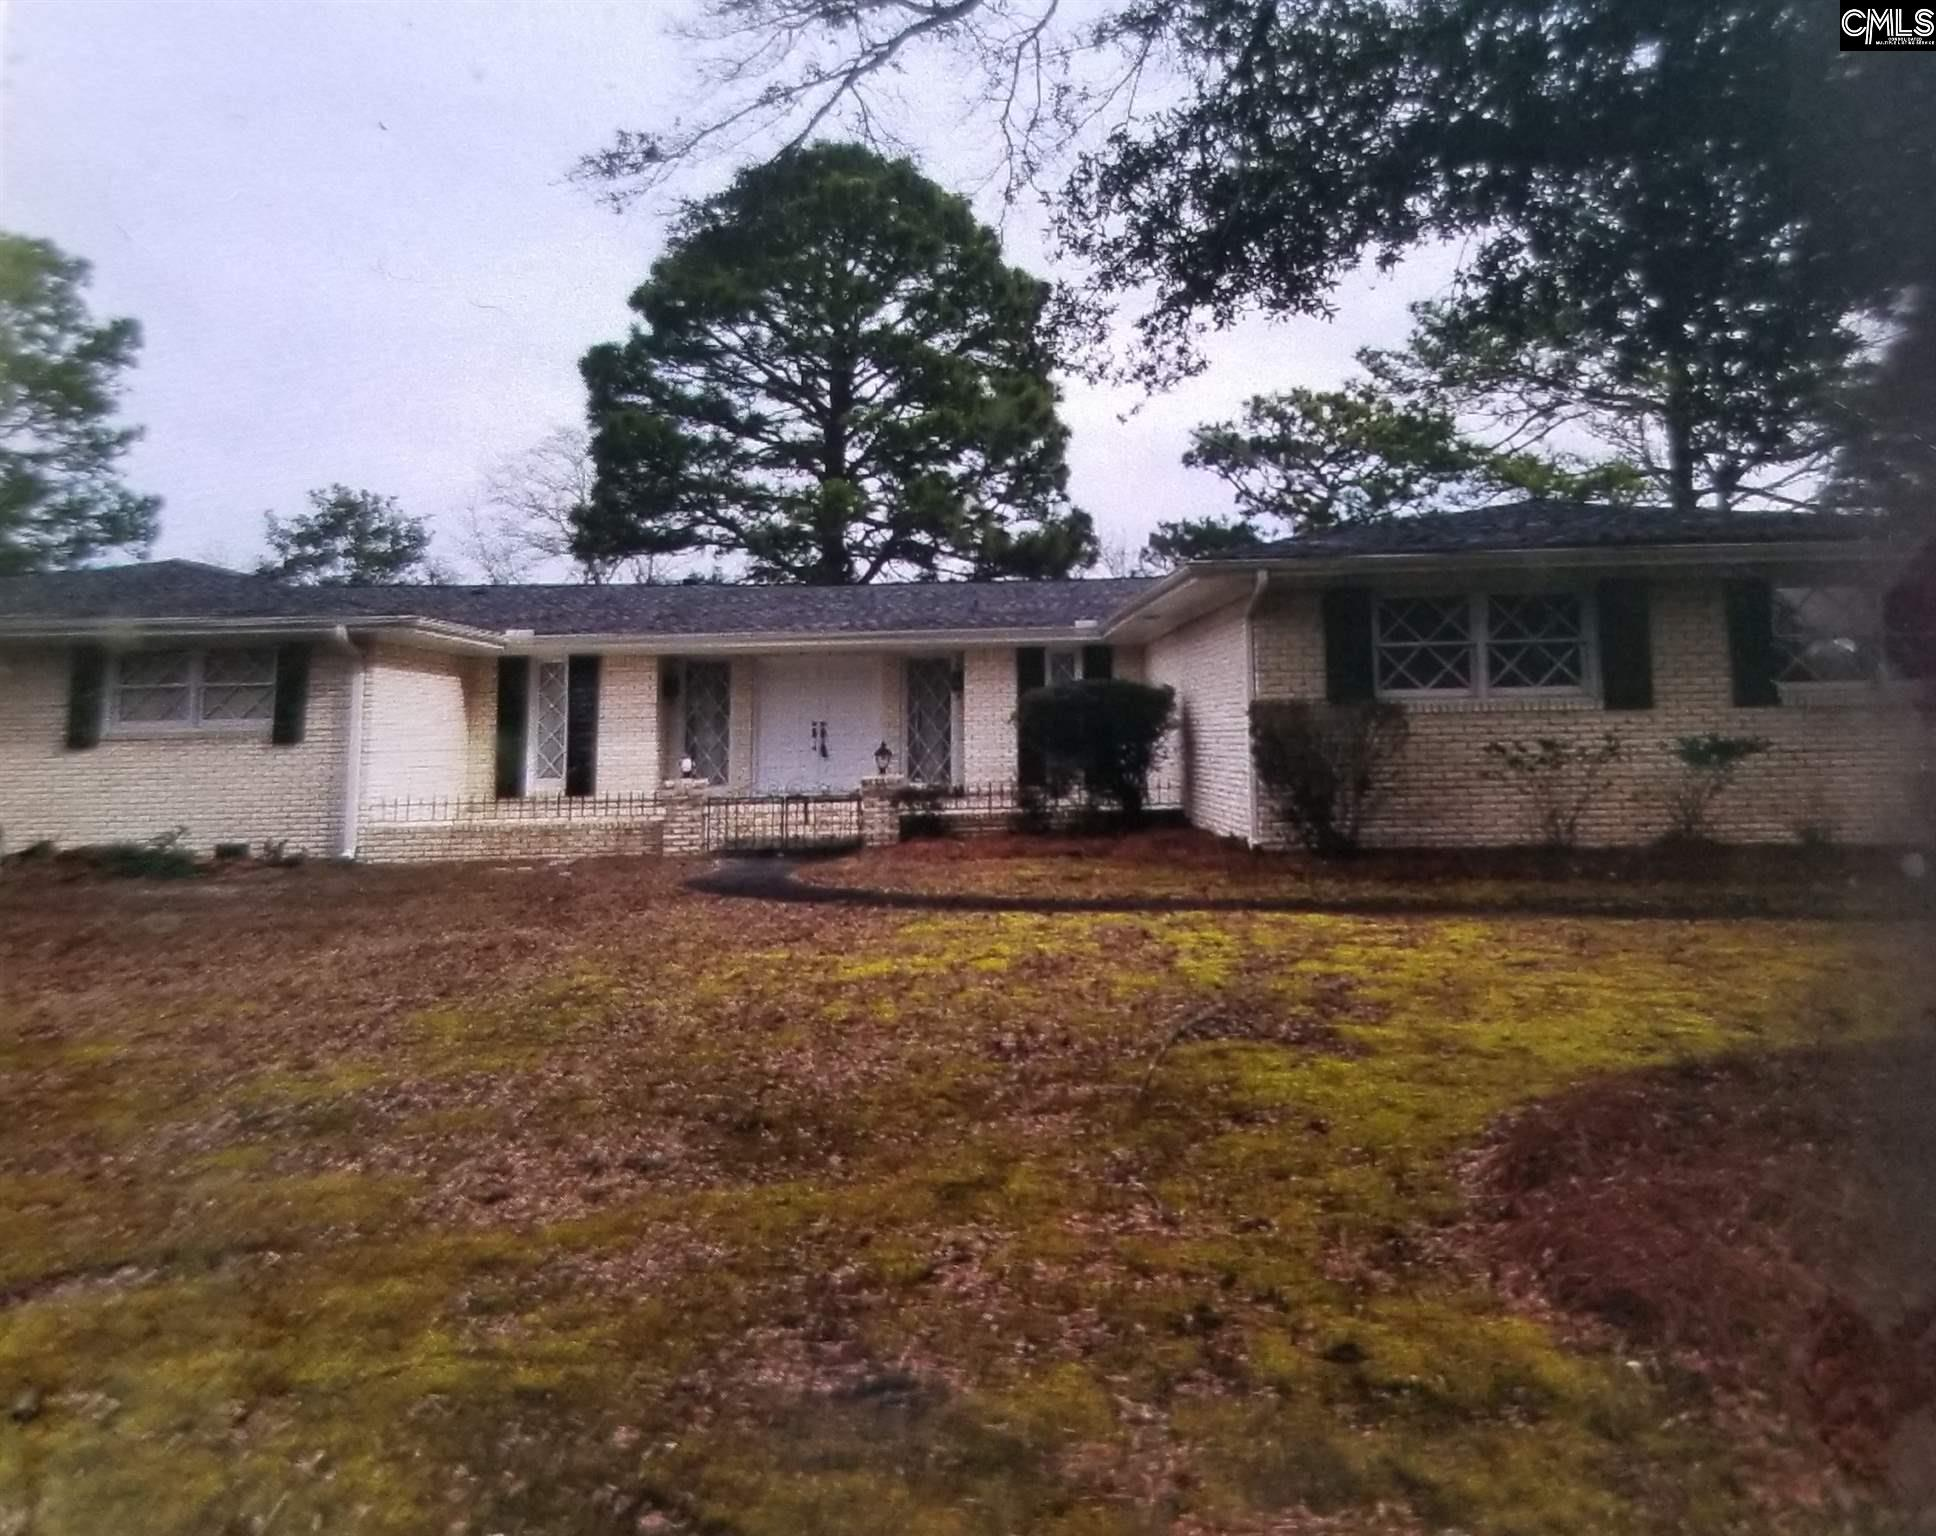 125 W. Parkshore Columbia, SC 29223